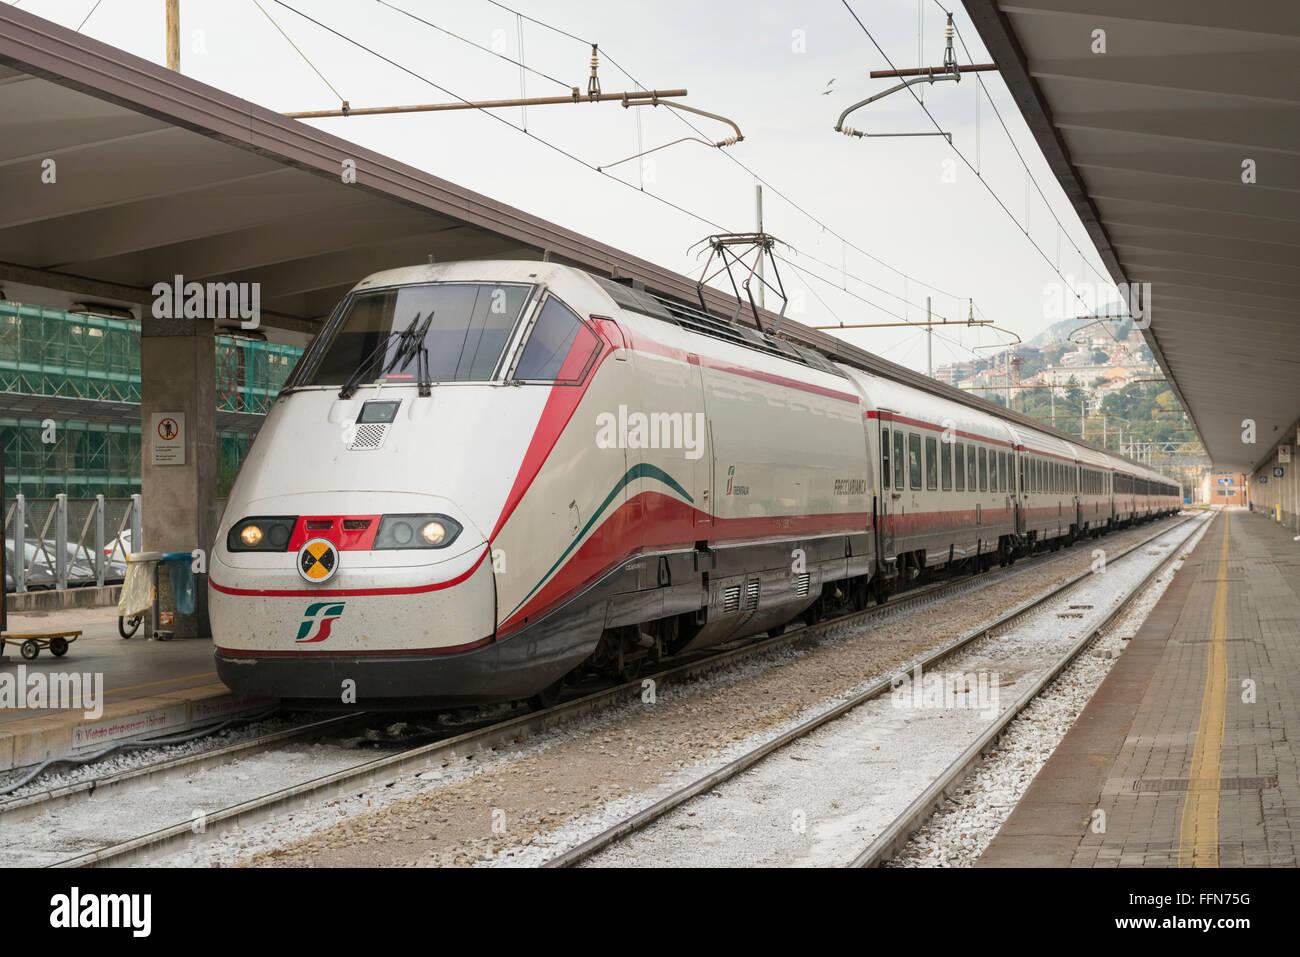 Trenitalia High Speed Train at Trieste Centrale Railway Station, Trieste, Italy, Europe - Stock Image